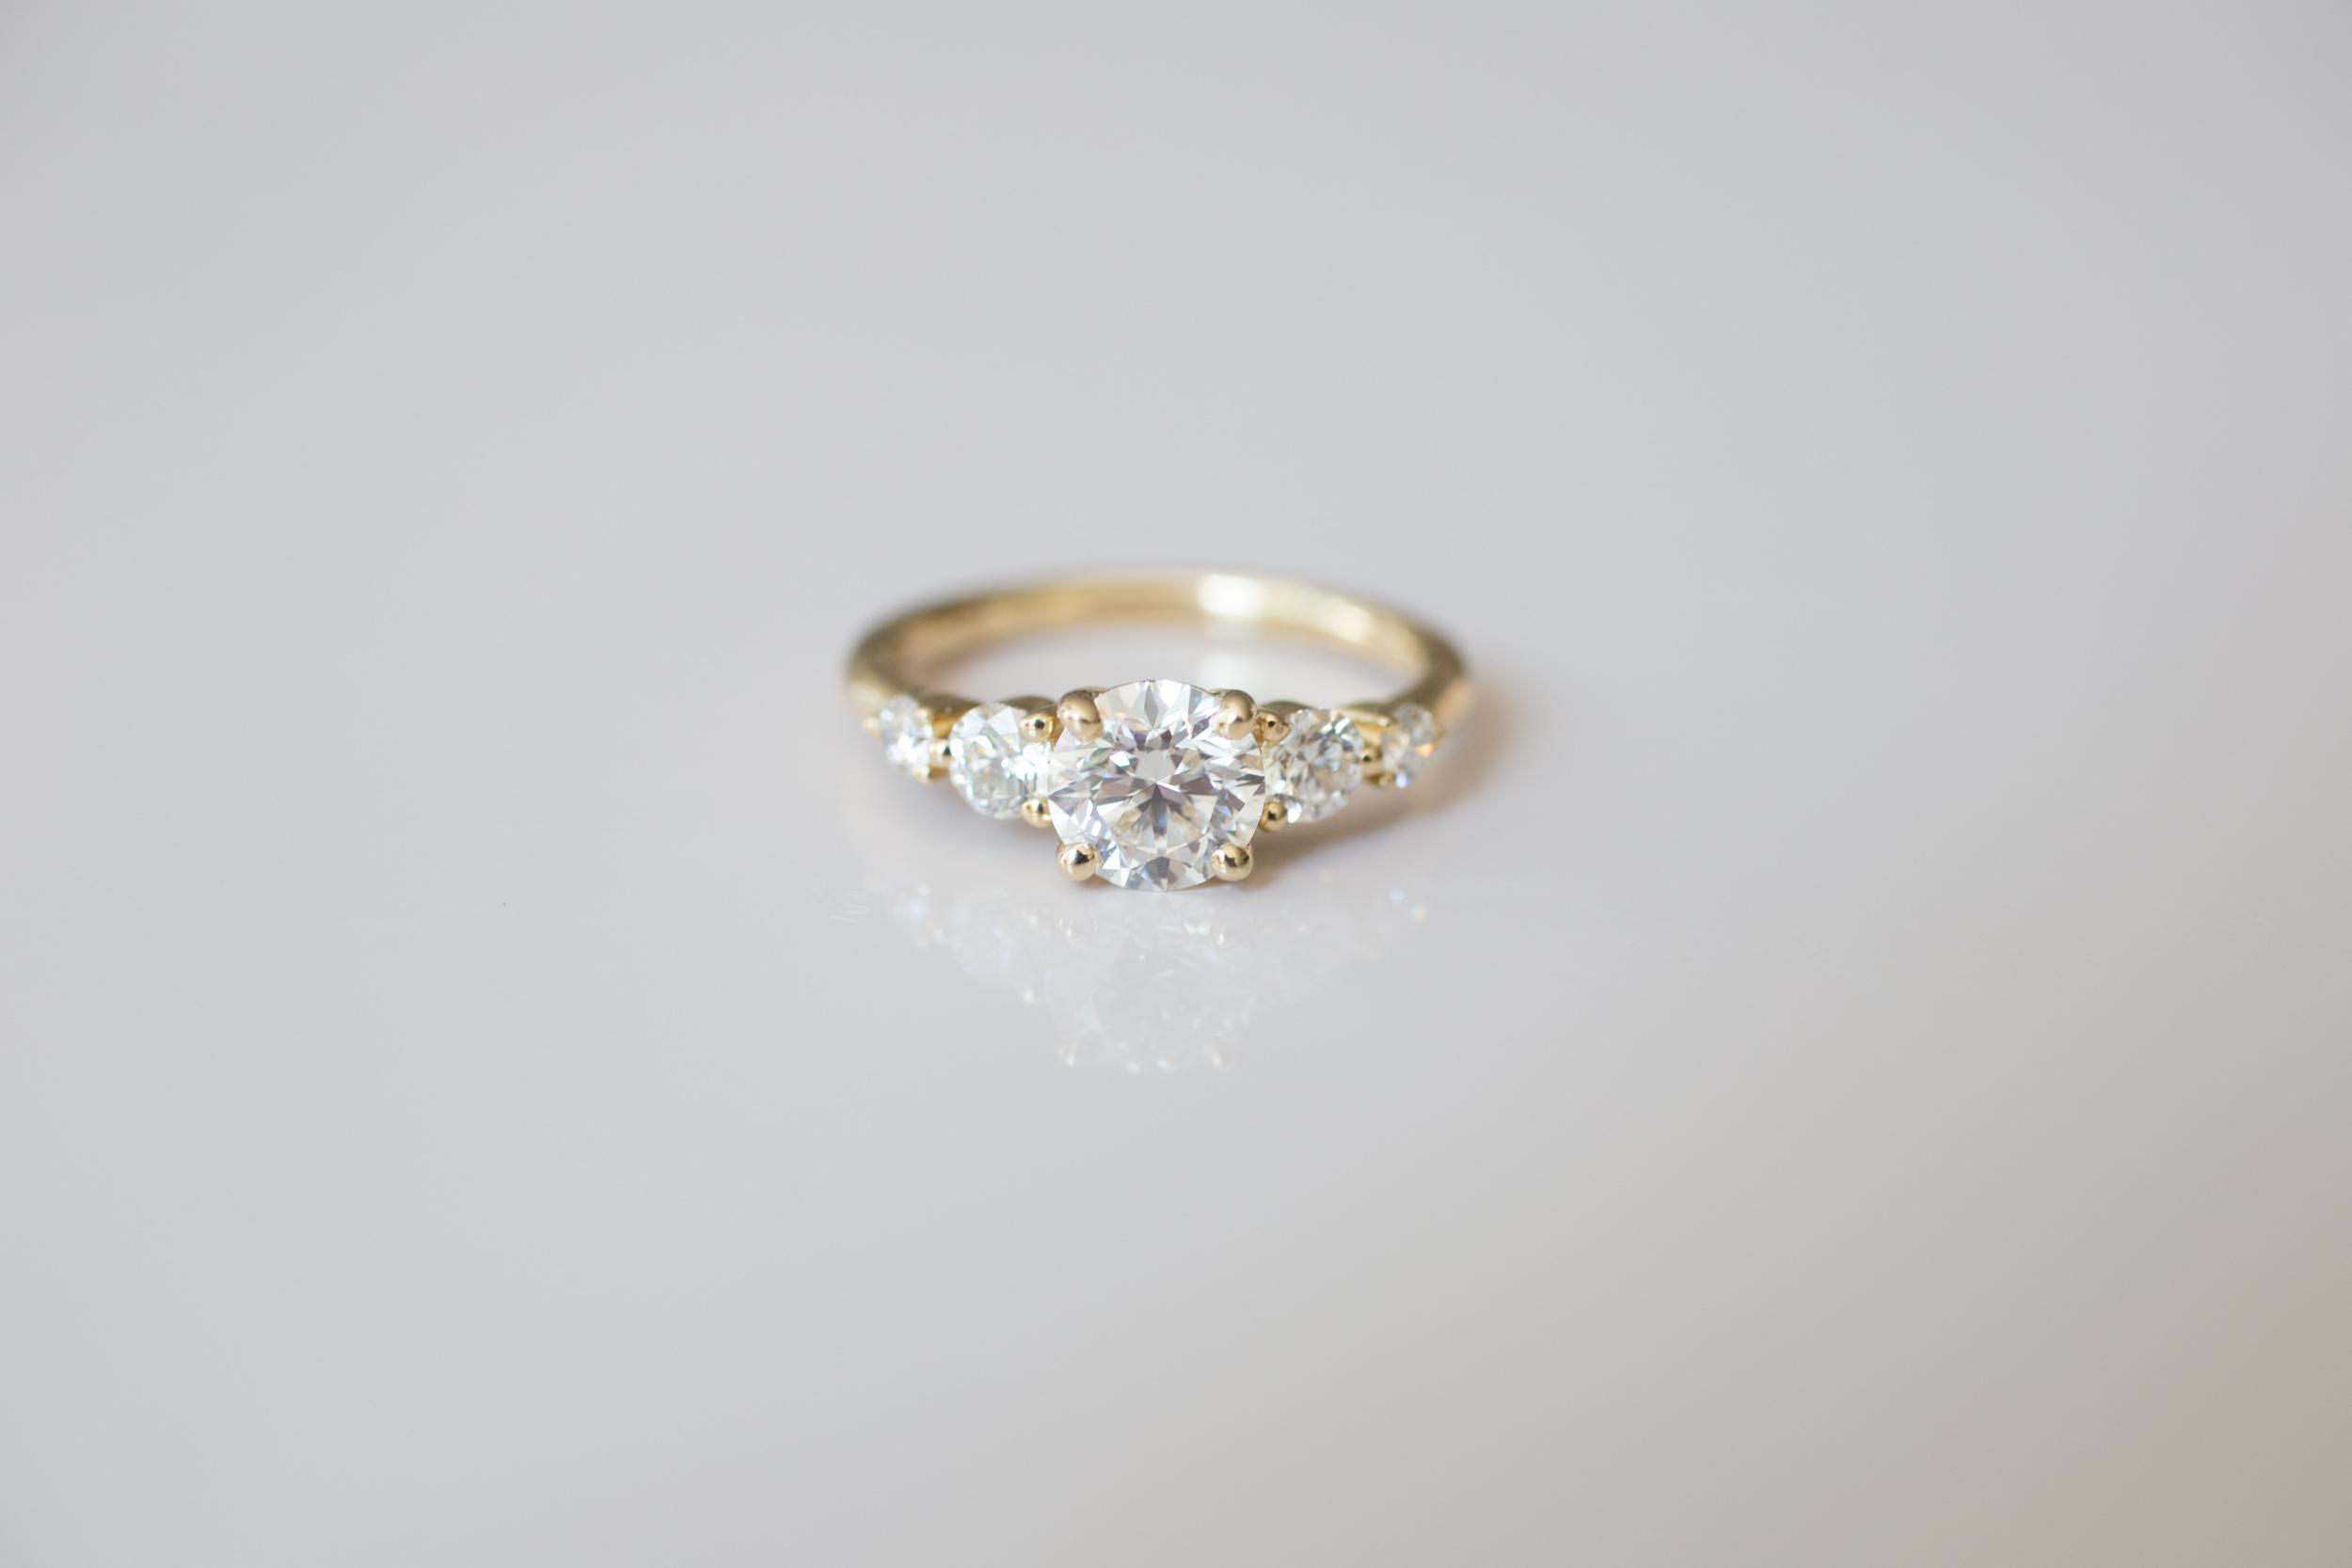 Dustin + Shauna 5 Stone Diamond Engagement-4.jpg